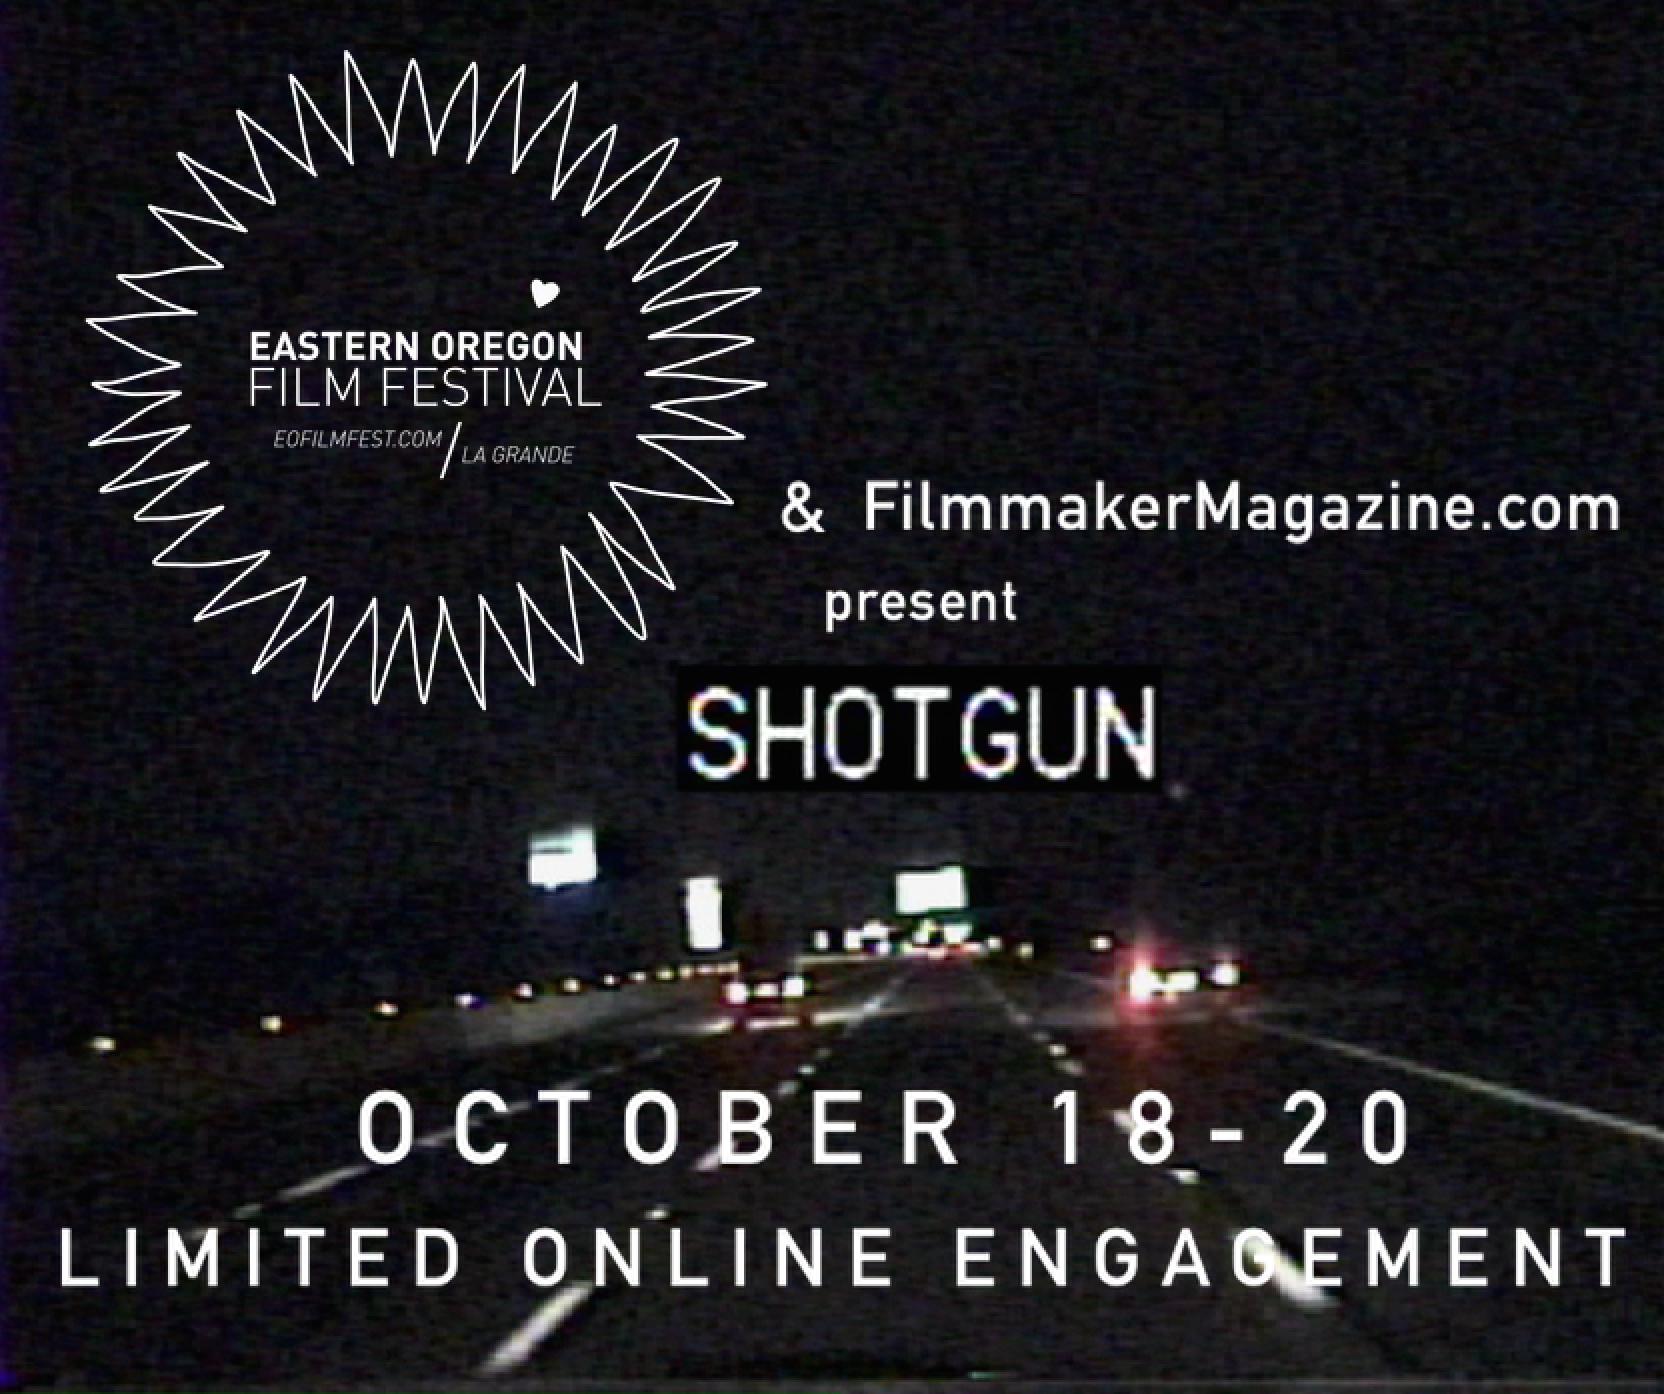 shotgun promo copy.png